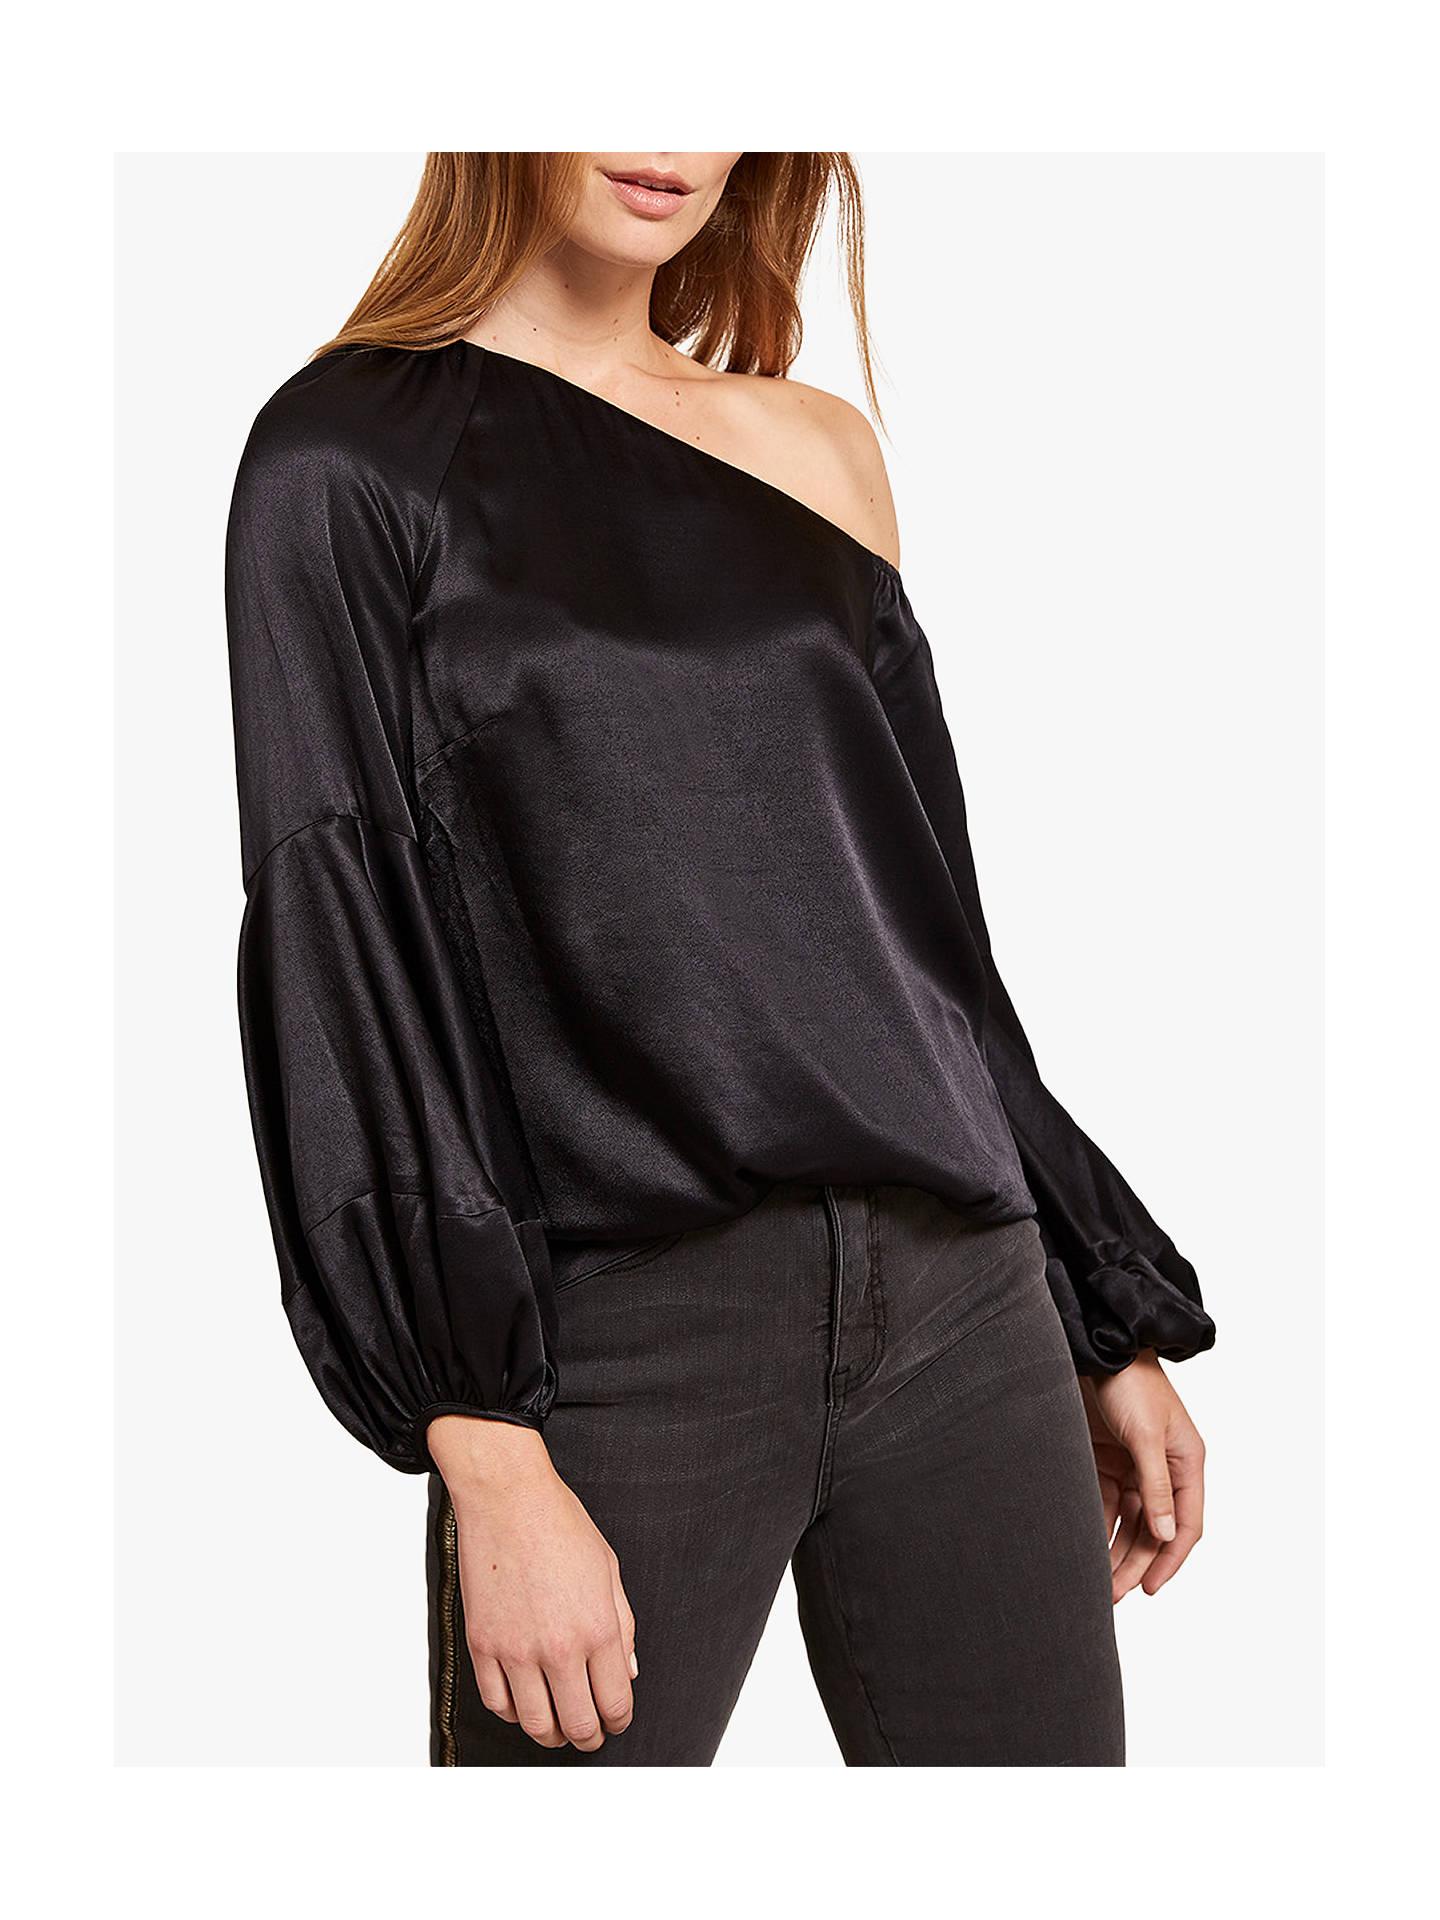 420adaa35c5d8 ... Buy Mint Velvet One Shoulder Satin Long Sleeve Top